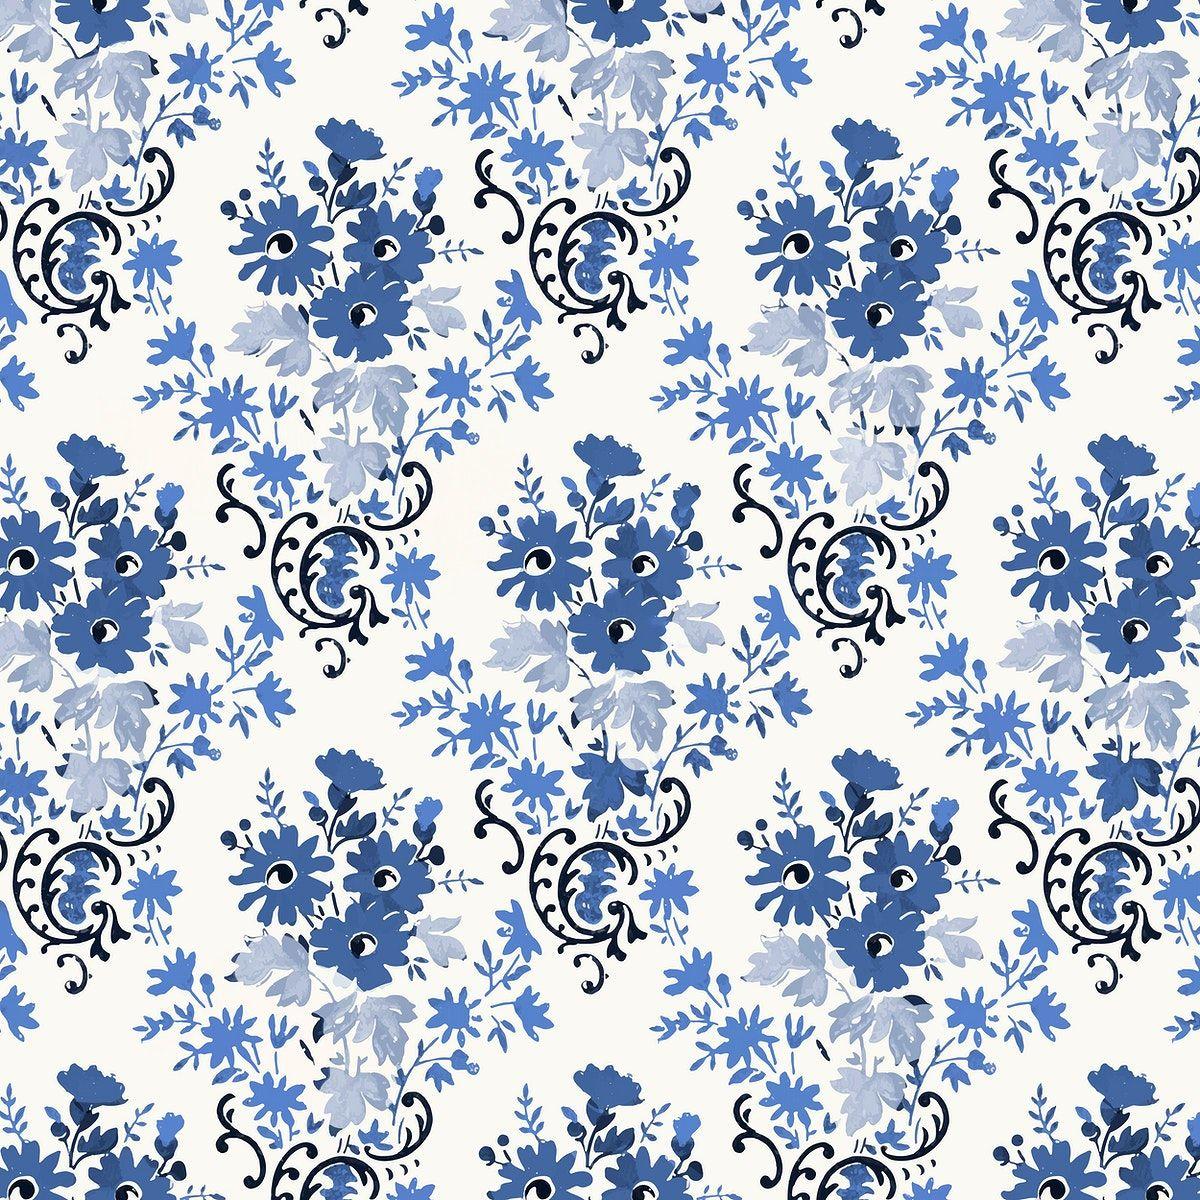 Floral Blue Vintage Style Background Vector Free Image By Rawpixel Com Gade In 2020 Vintage Flower Backgrounds Botanical Illustration Texture Design